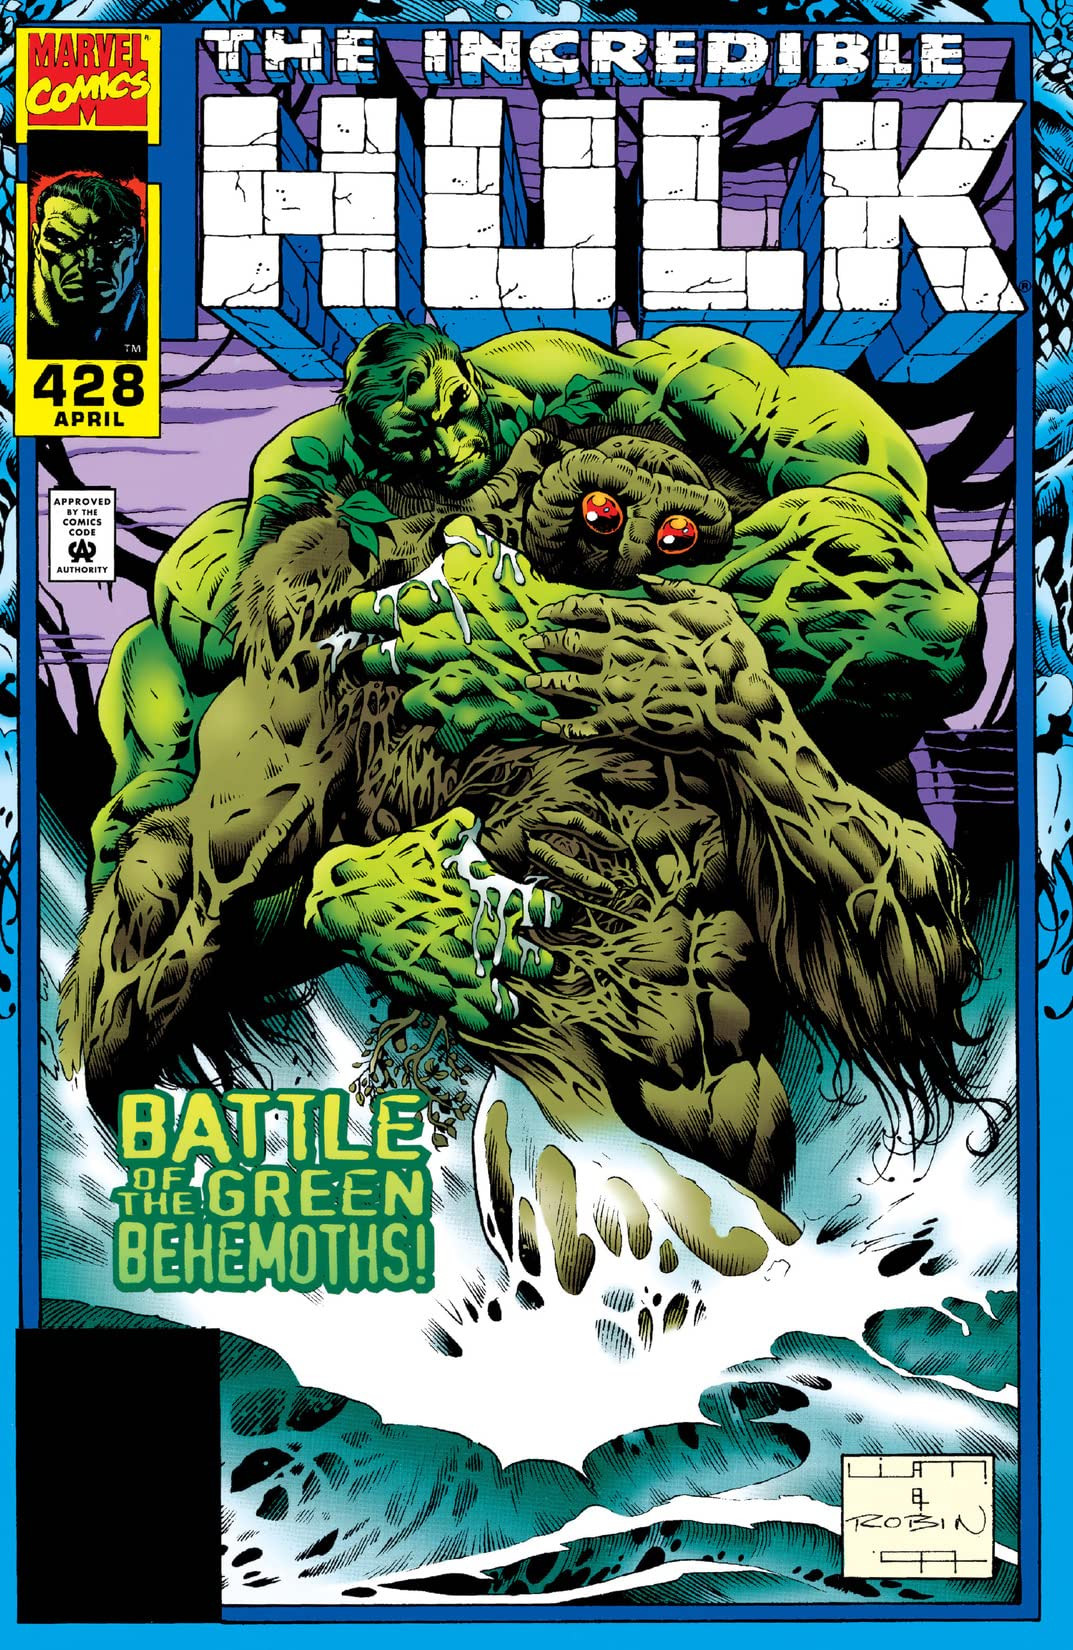 Incredible Hulk Vol 1 428.jpg